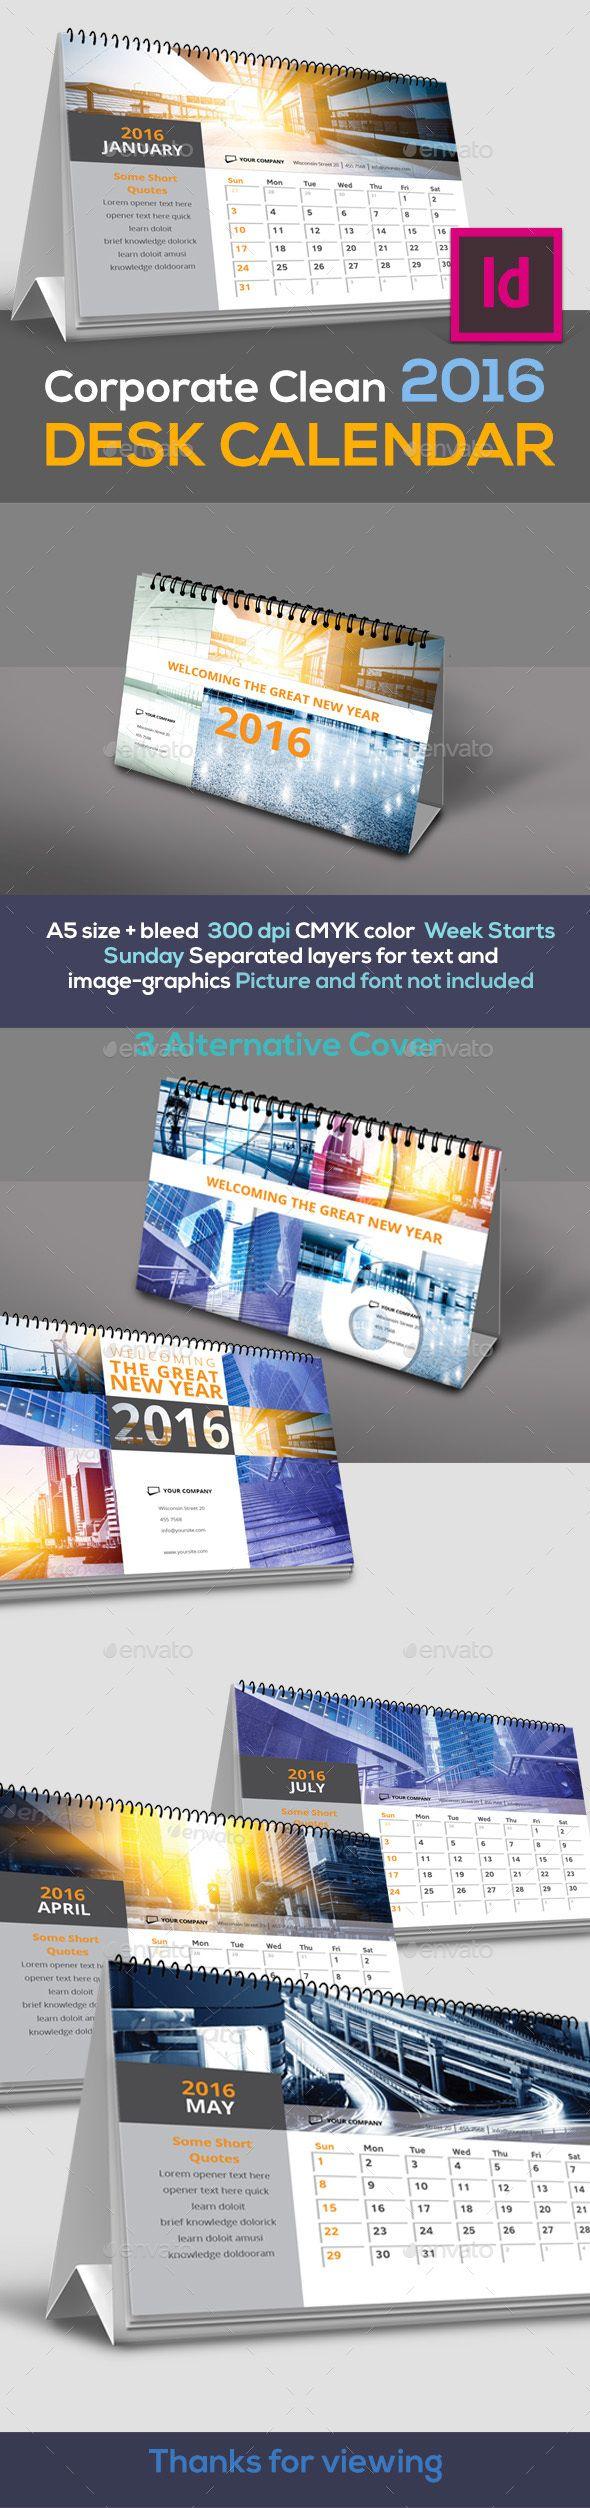 Corporate Desk Calendar 2016 - Calendars Stationery